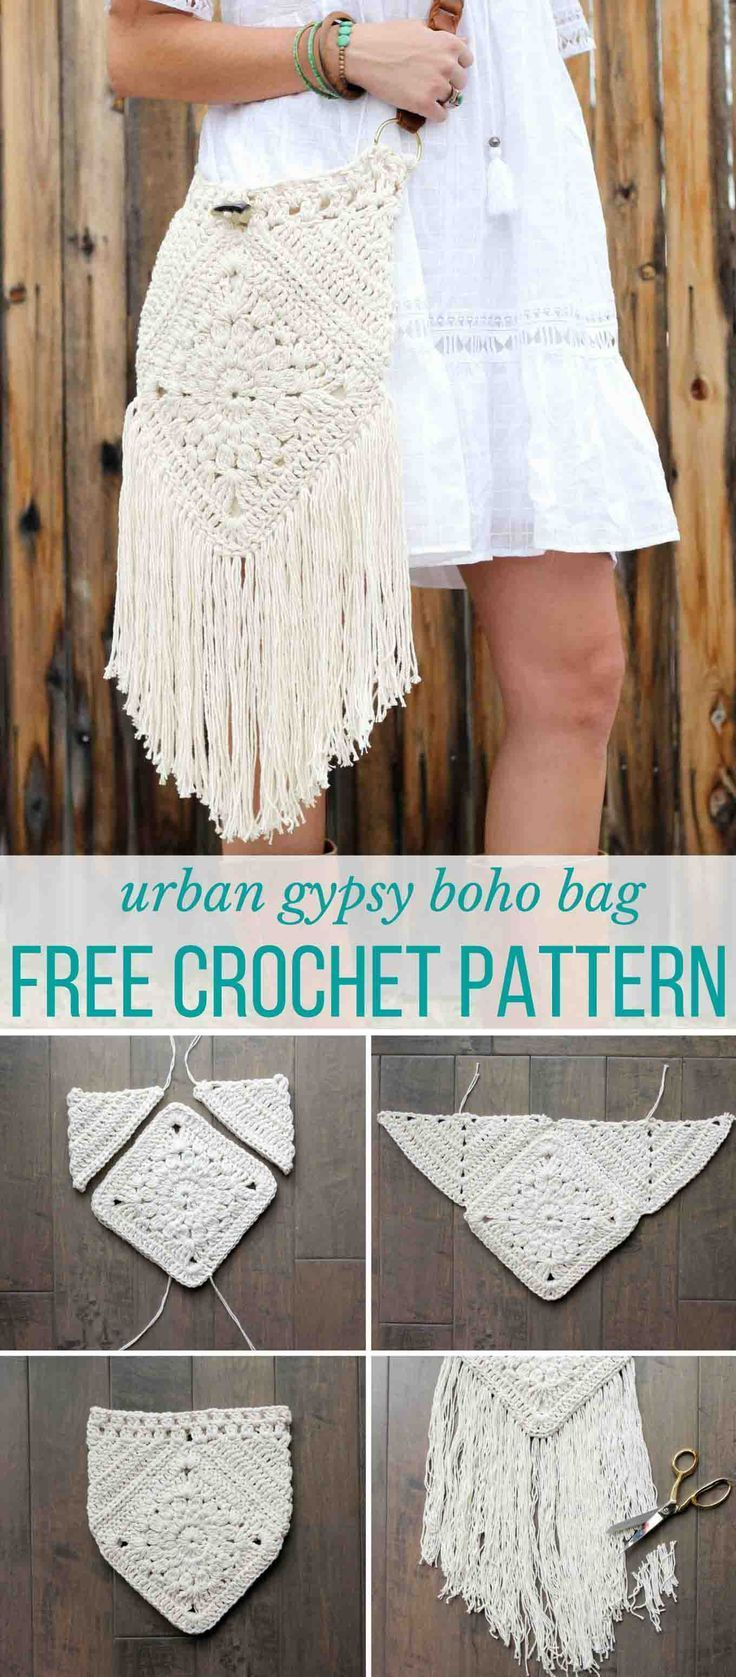 Urban Gypsy Boho Bag – Gratis Häkelanleitung – Häkel- und Strickanleitung   – Crochet – Easy Pin